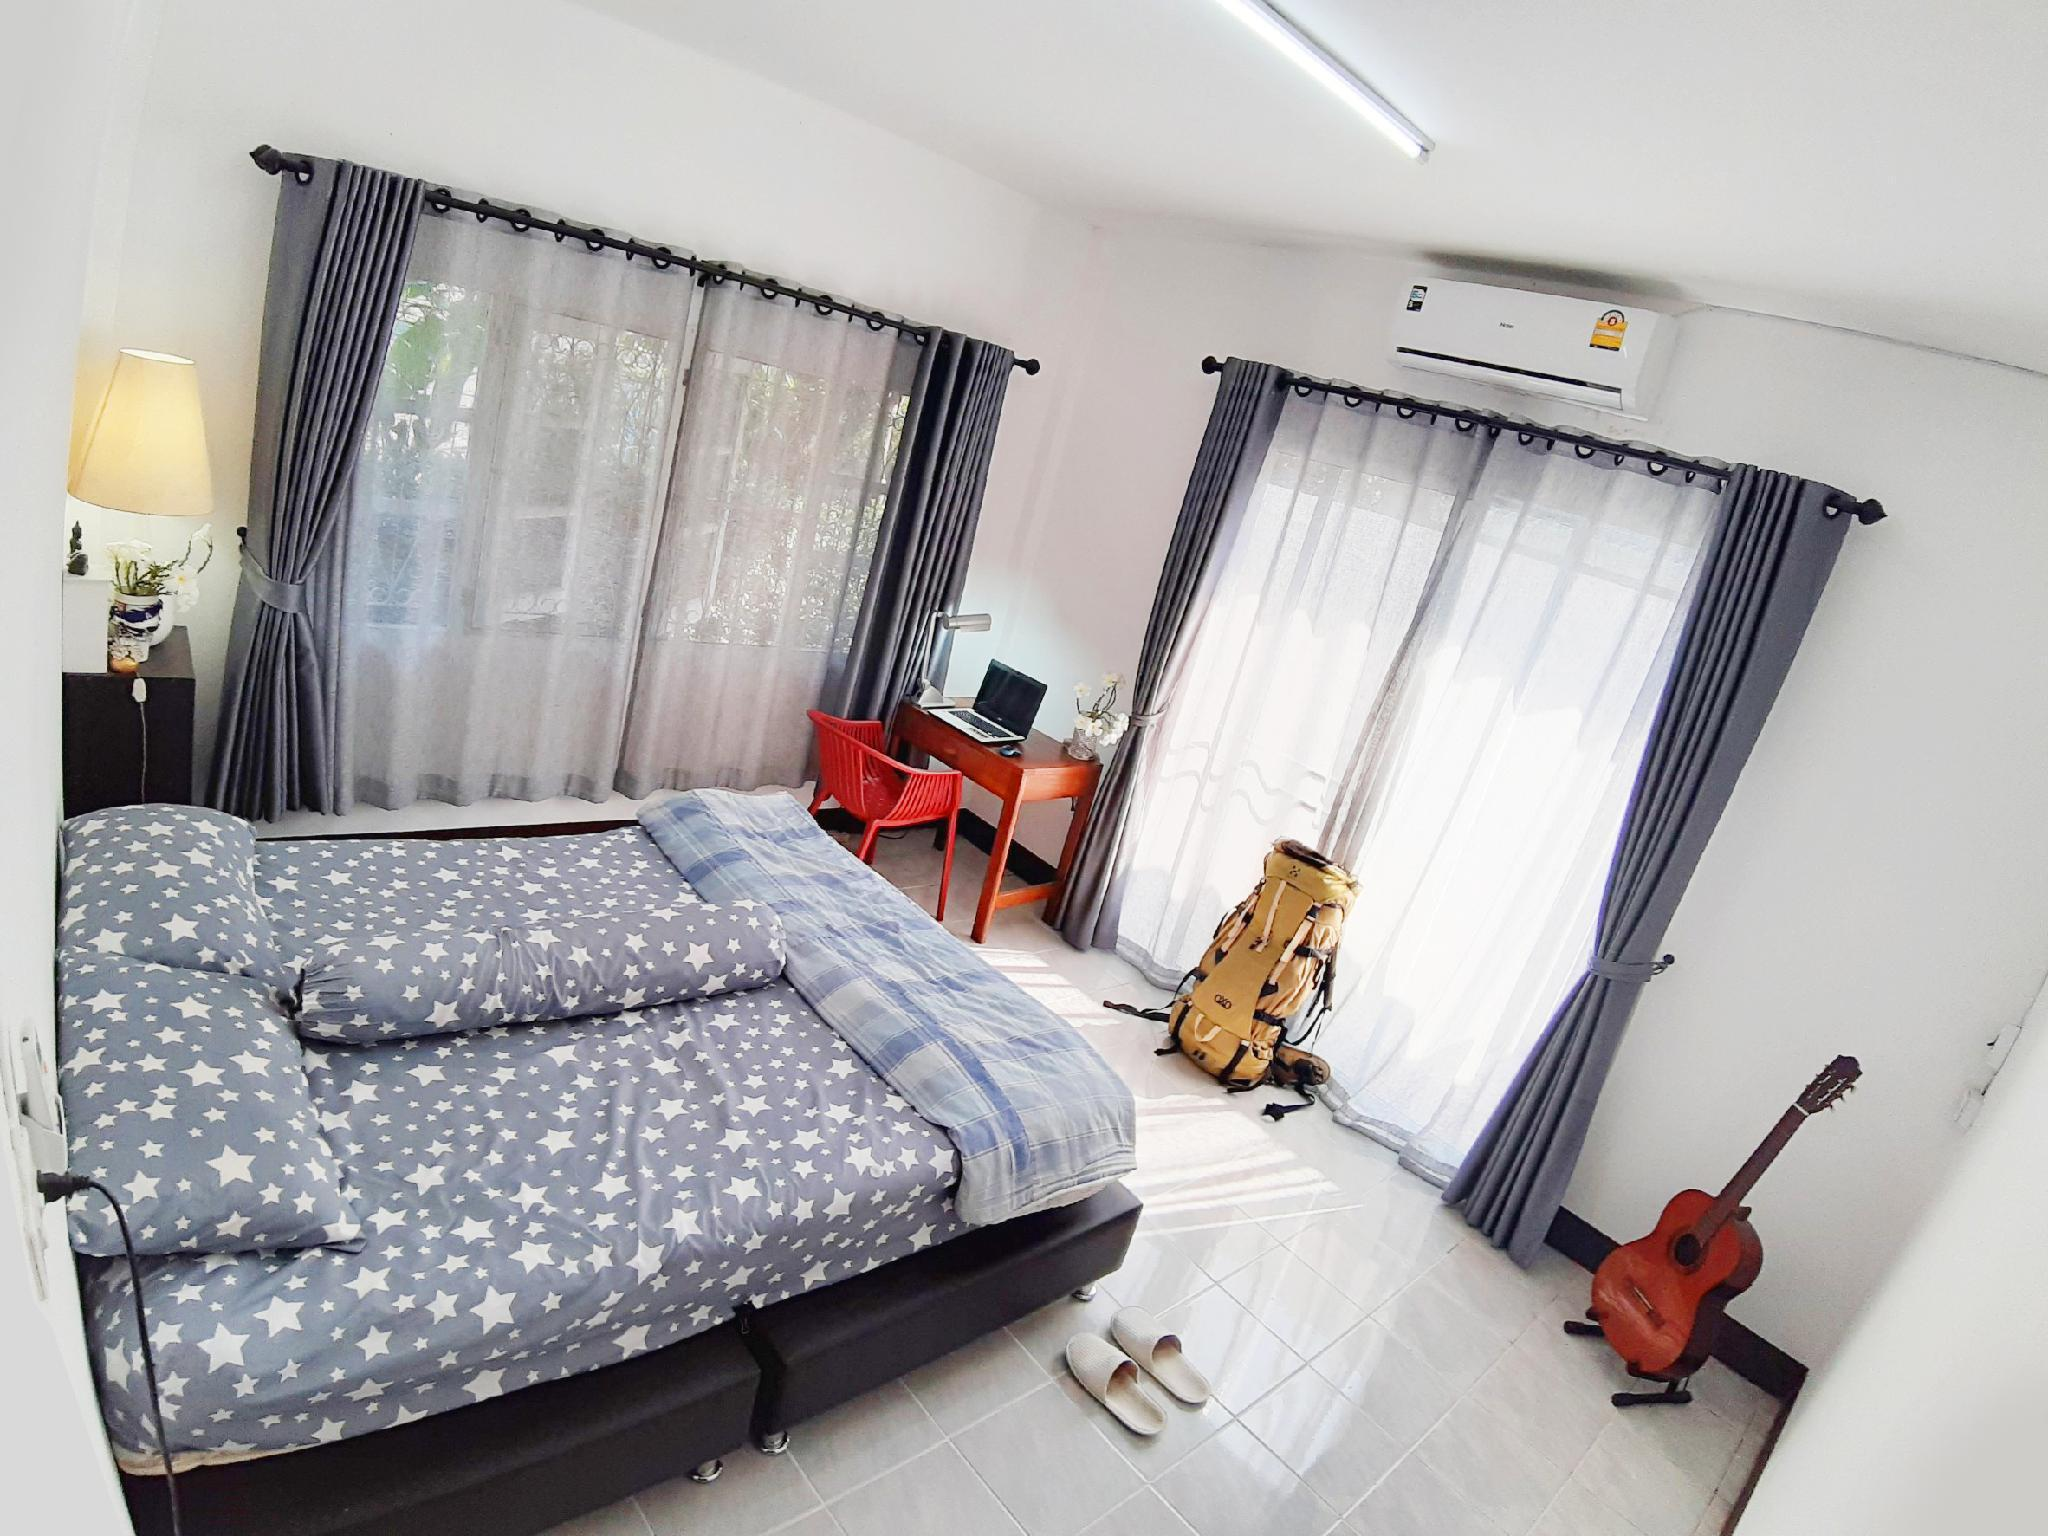 Mj House Bedroom Stay With HOST & GUEST. บ้านเดี่ยว 2 ห้องนอน 2 ห้องน้ำส่วนตัว ขนาด 370 ตร.ม. – แม่โจ้